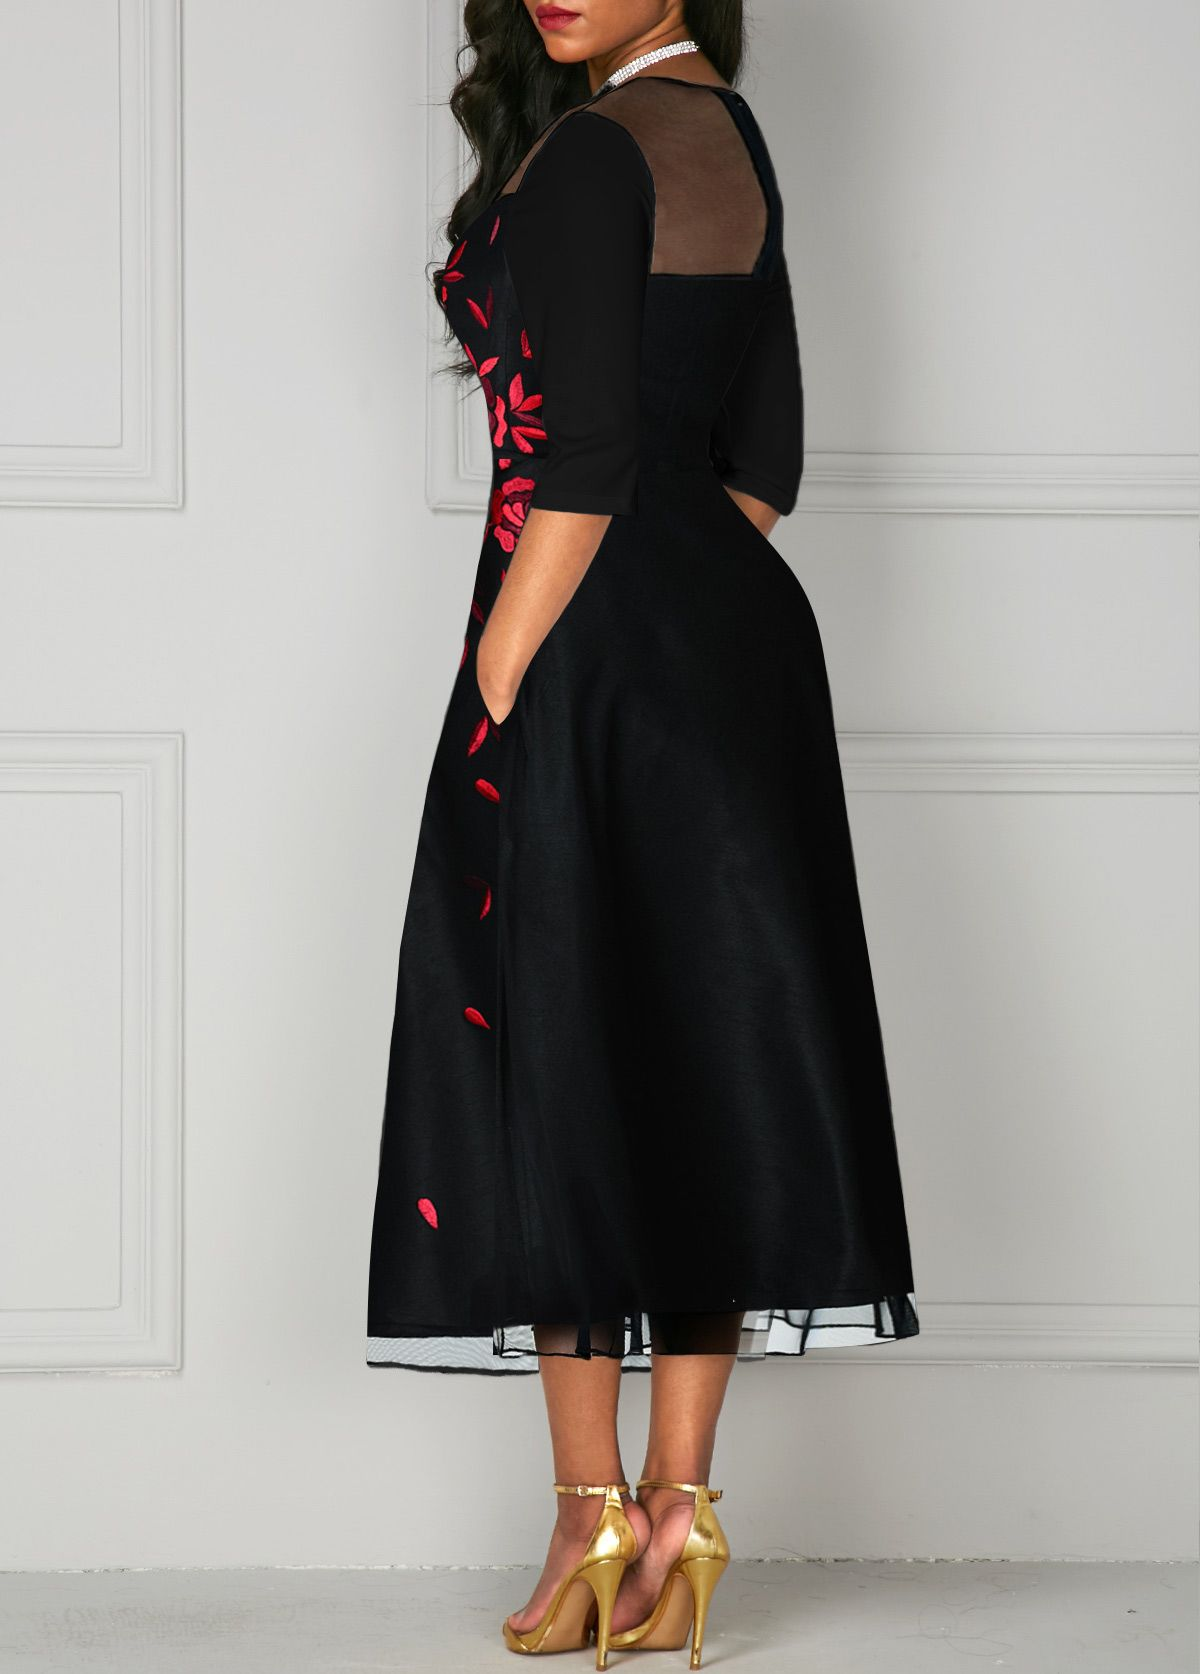 V Neck Mesh Panel Flower Print Black Dress Vintage